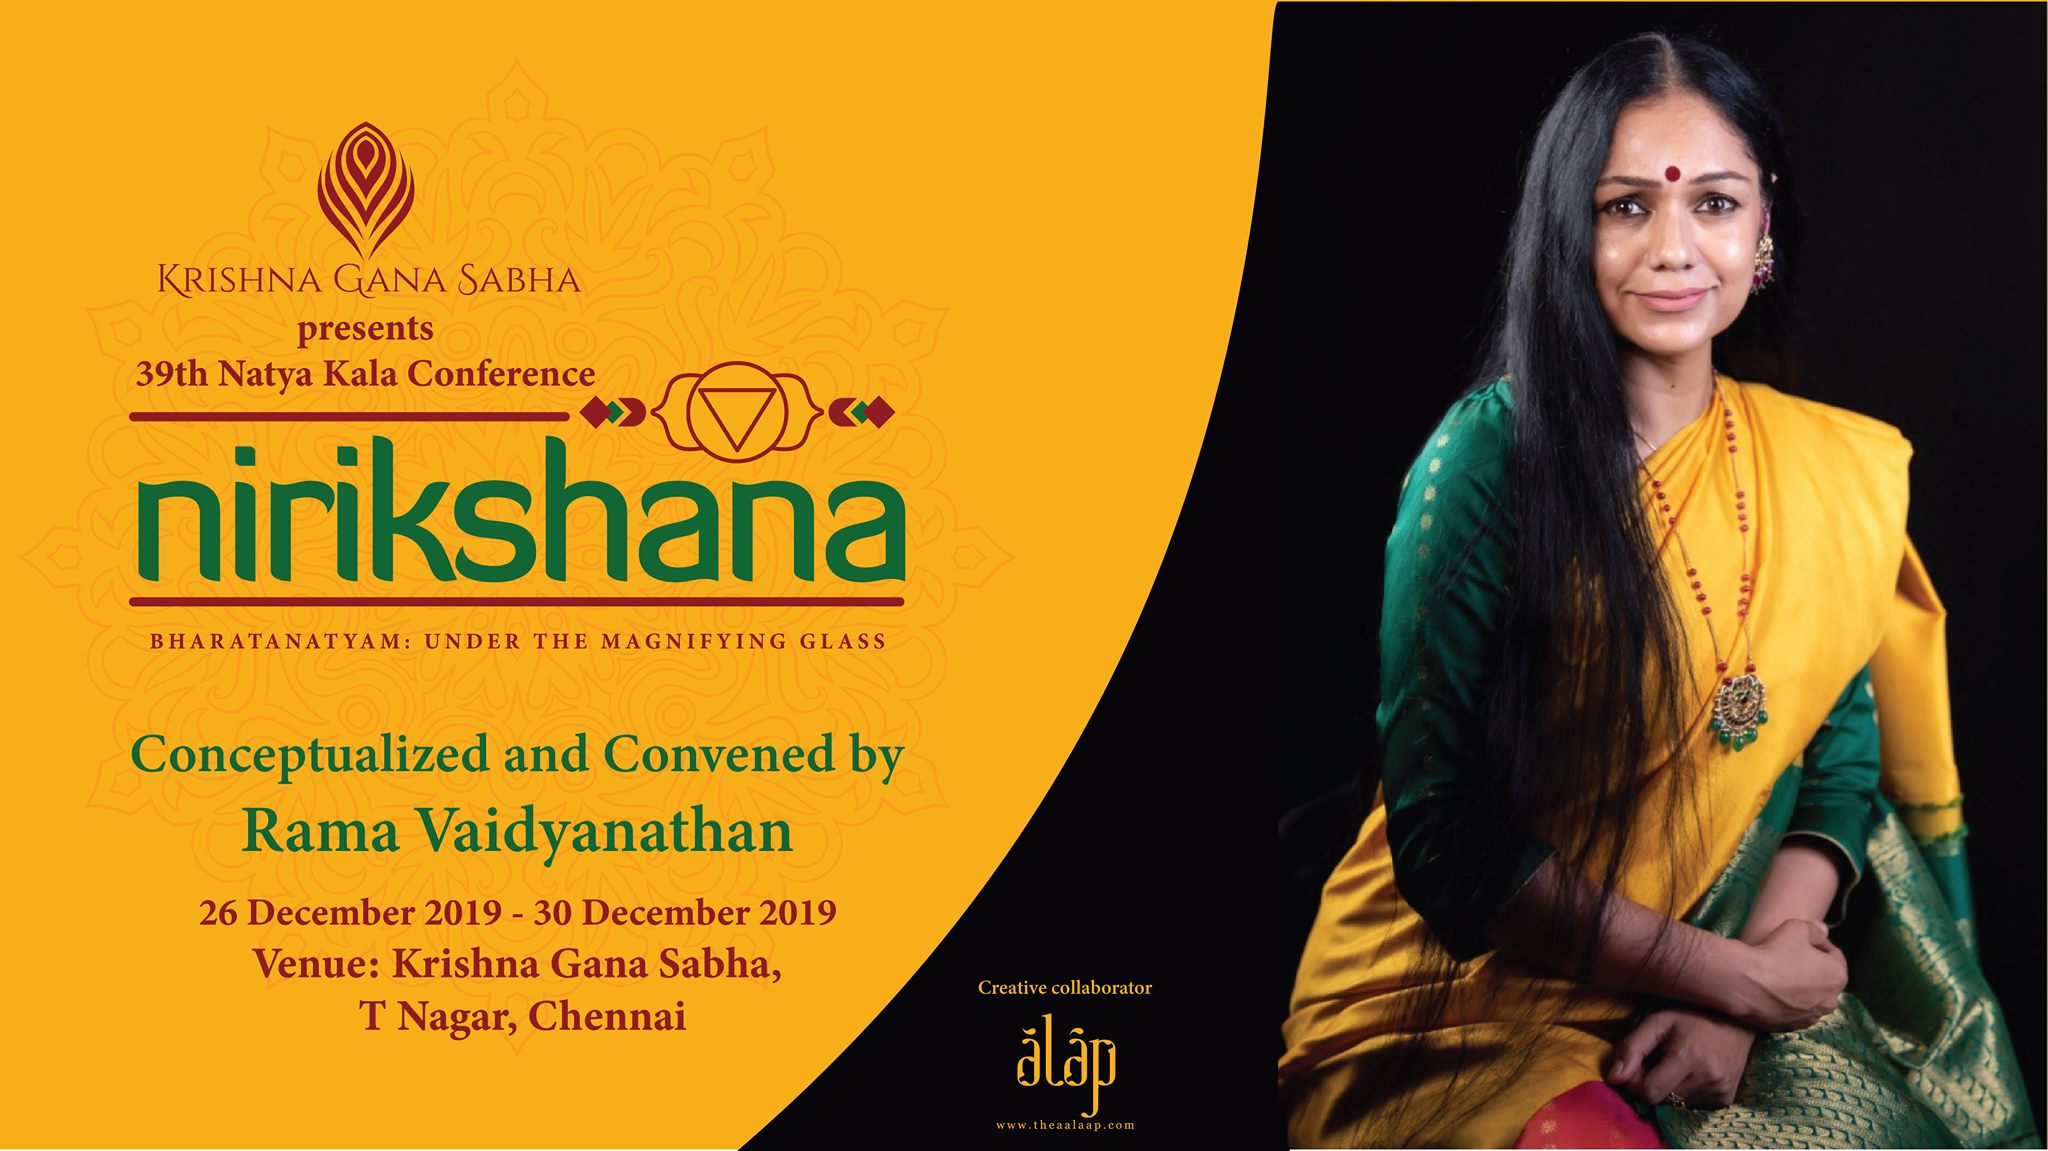 Natya Kala Conference 2019